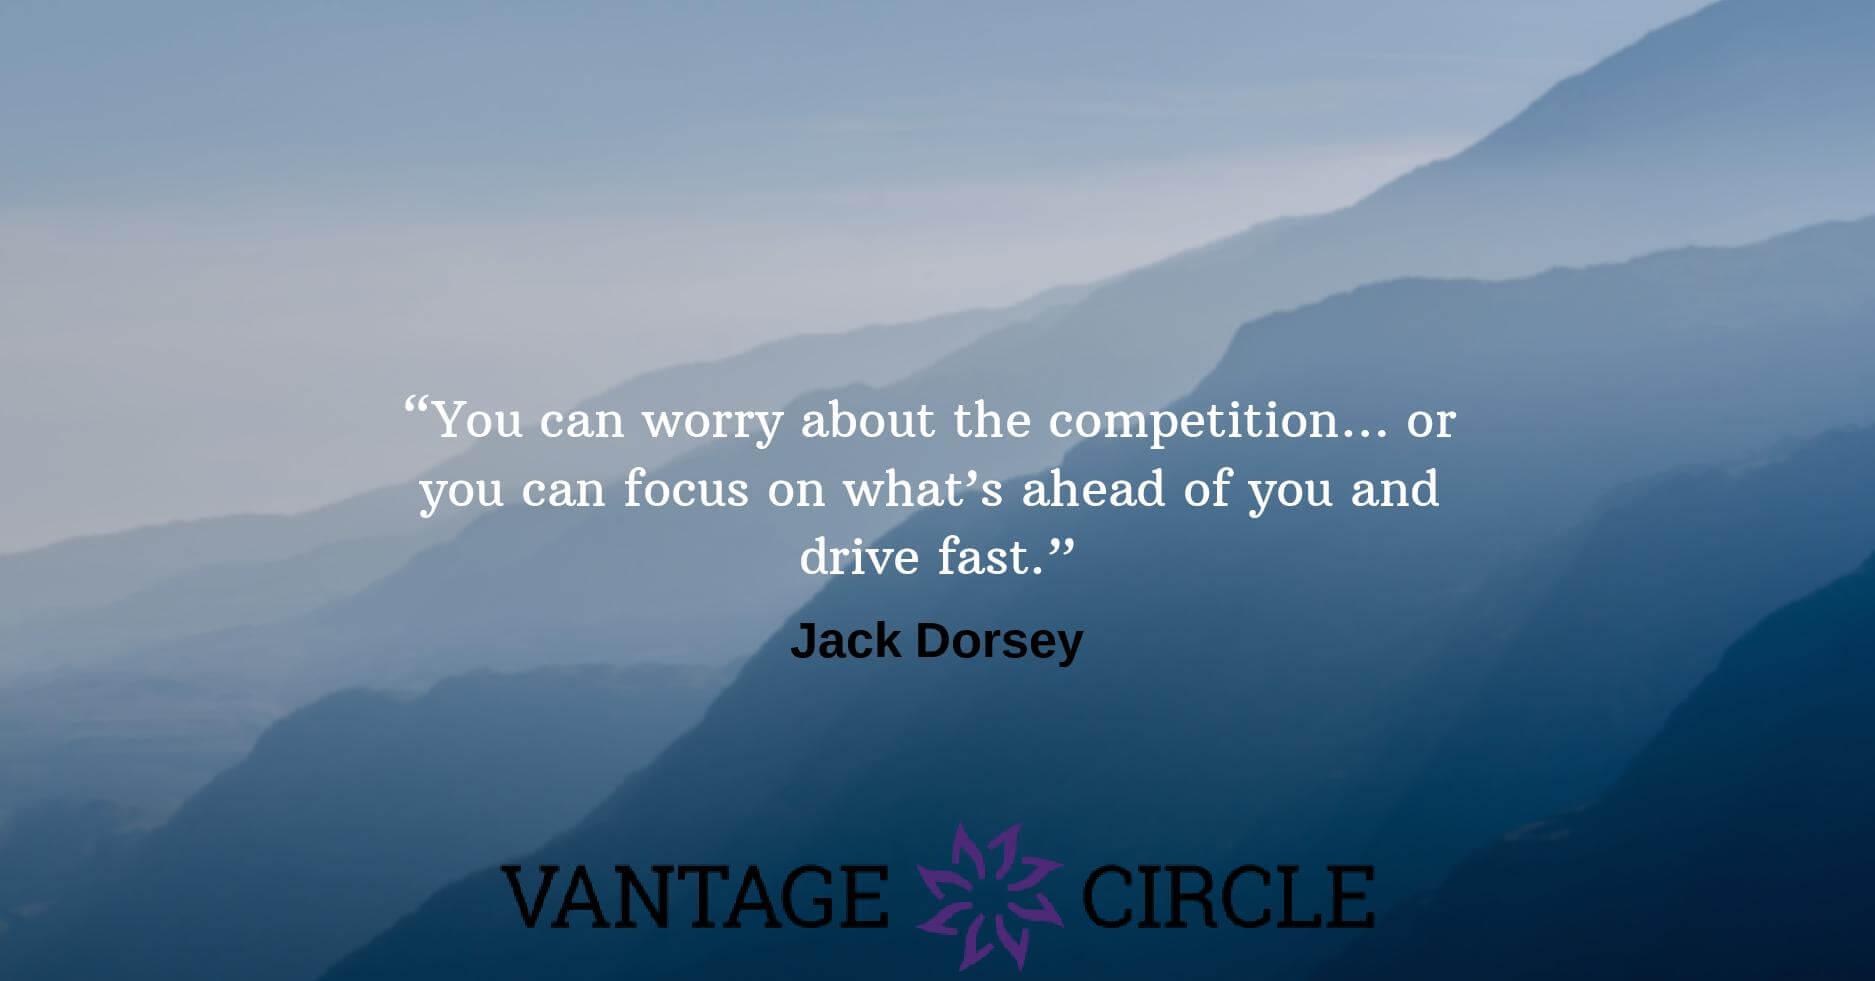 Employee-motivational-quotes-Jack-Dorsey